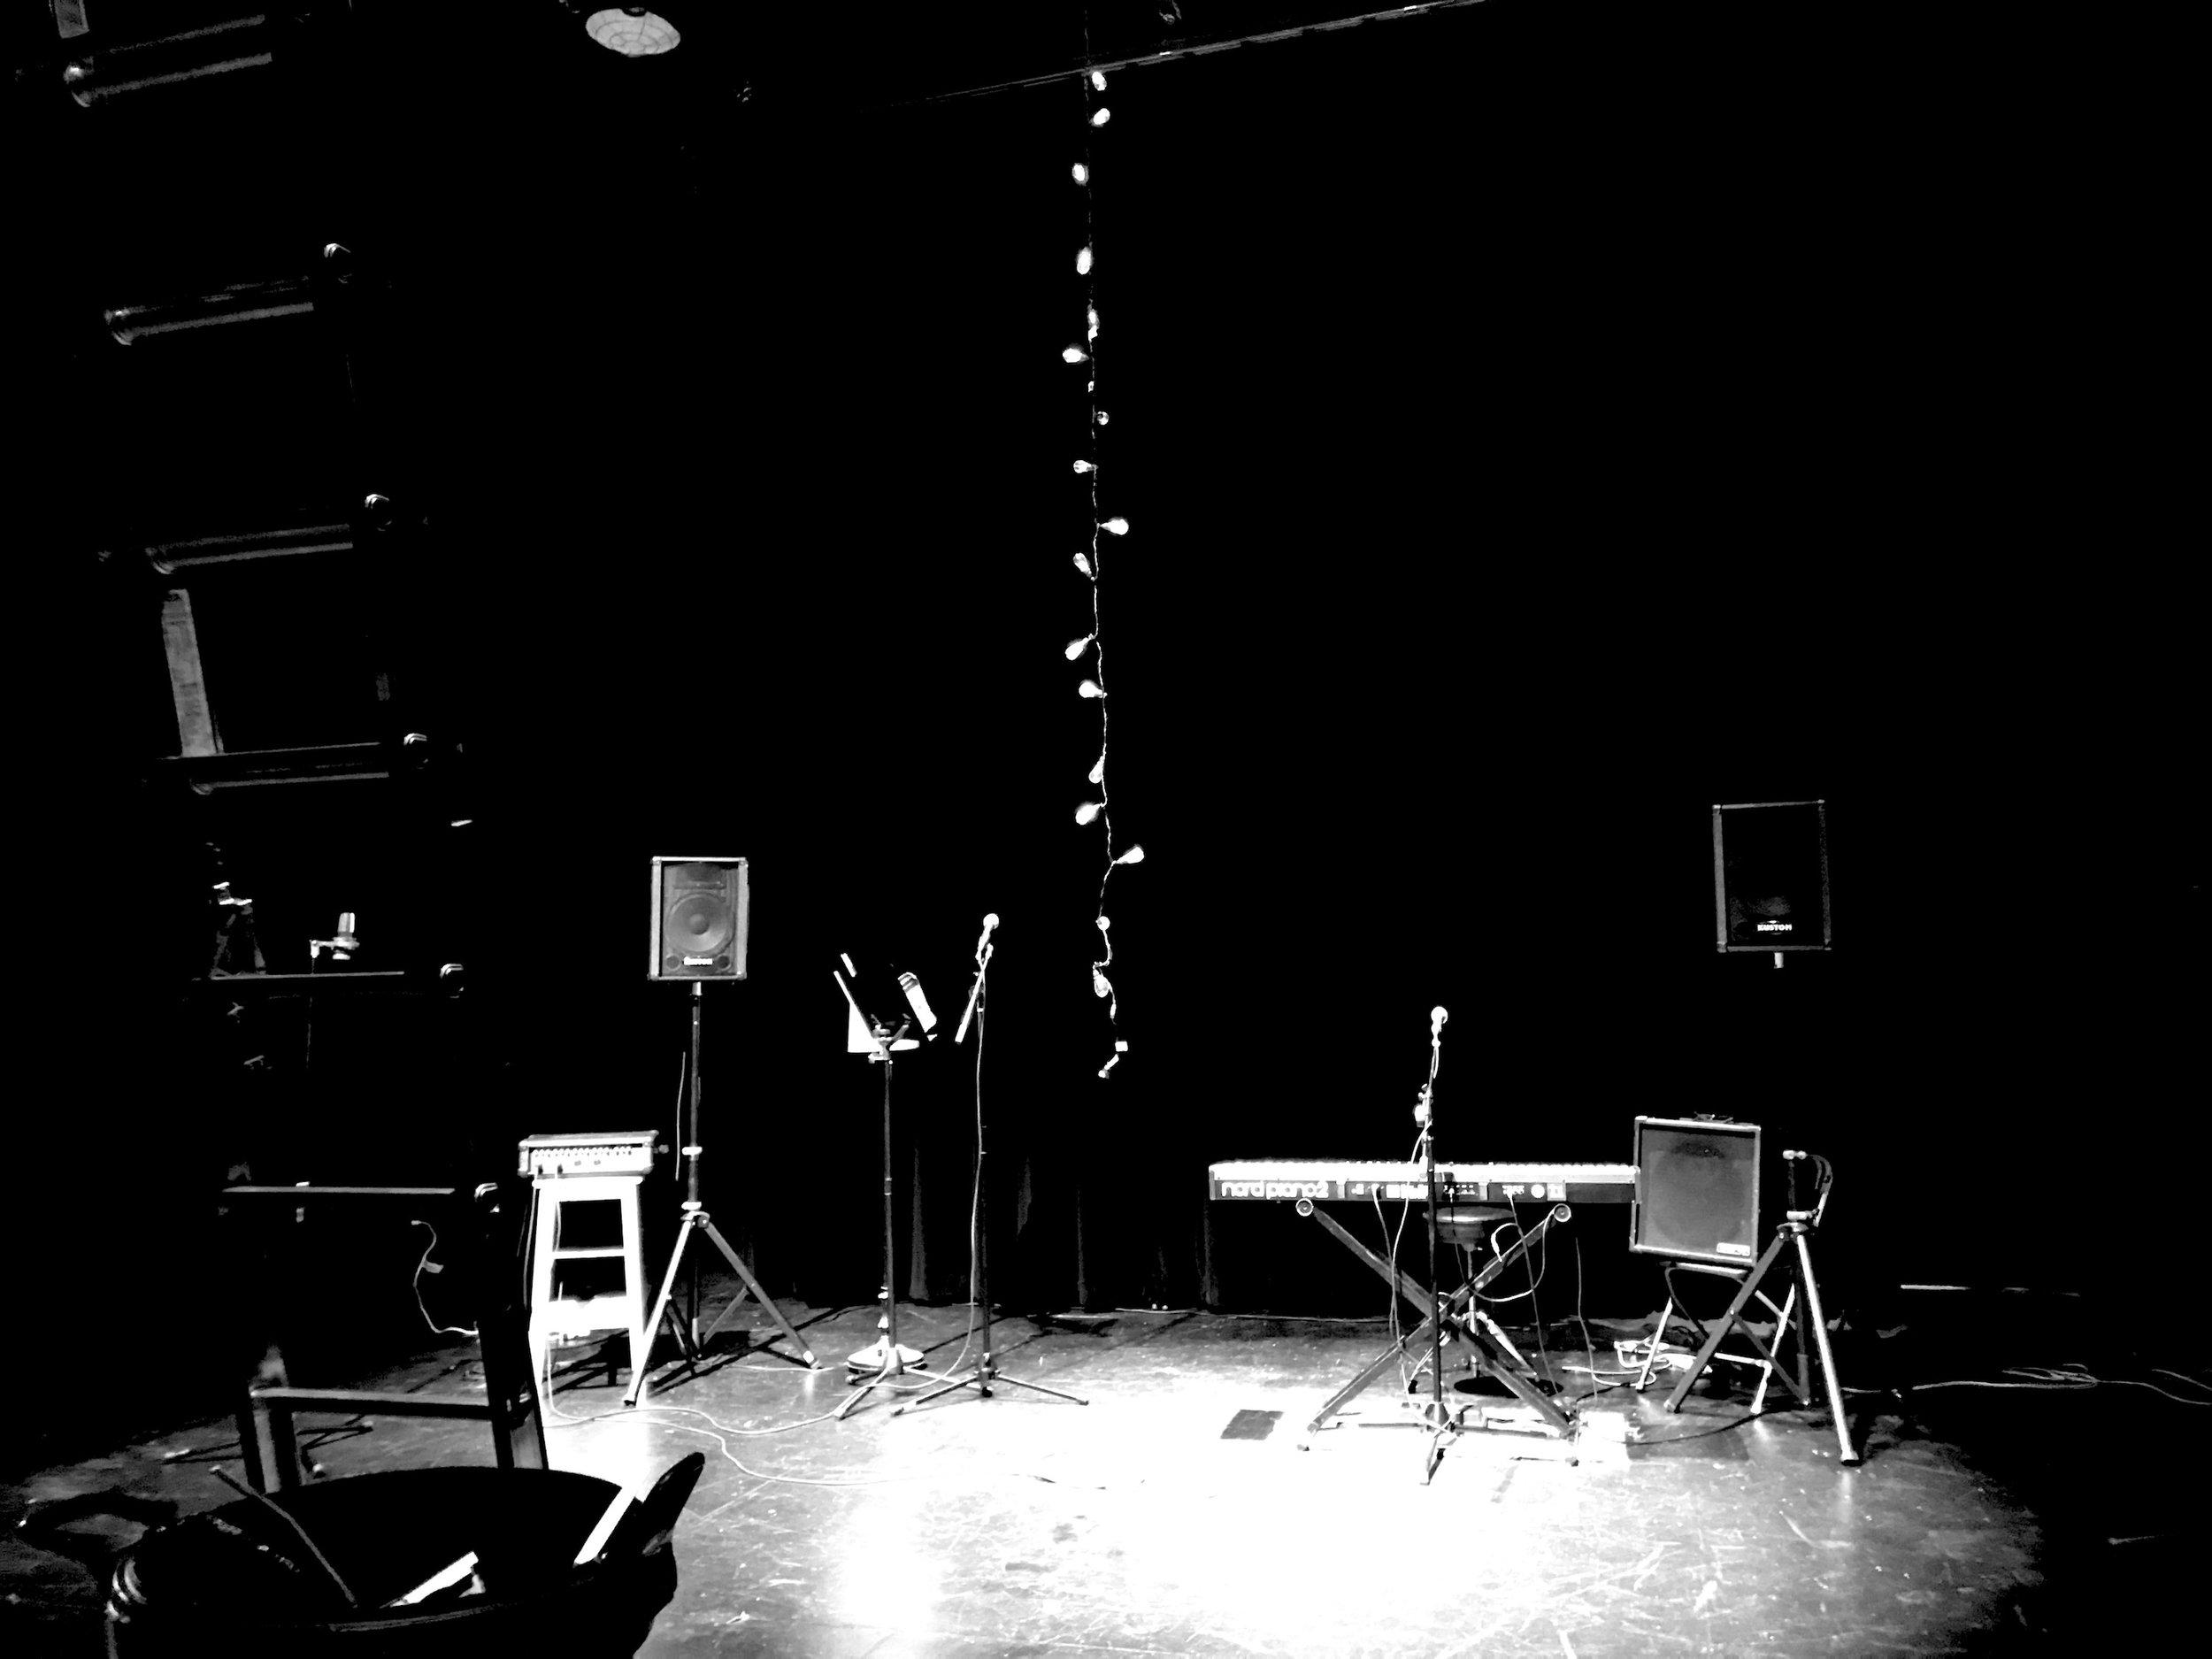 stage set copy 2.jpg